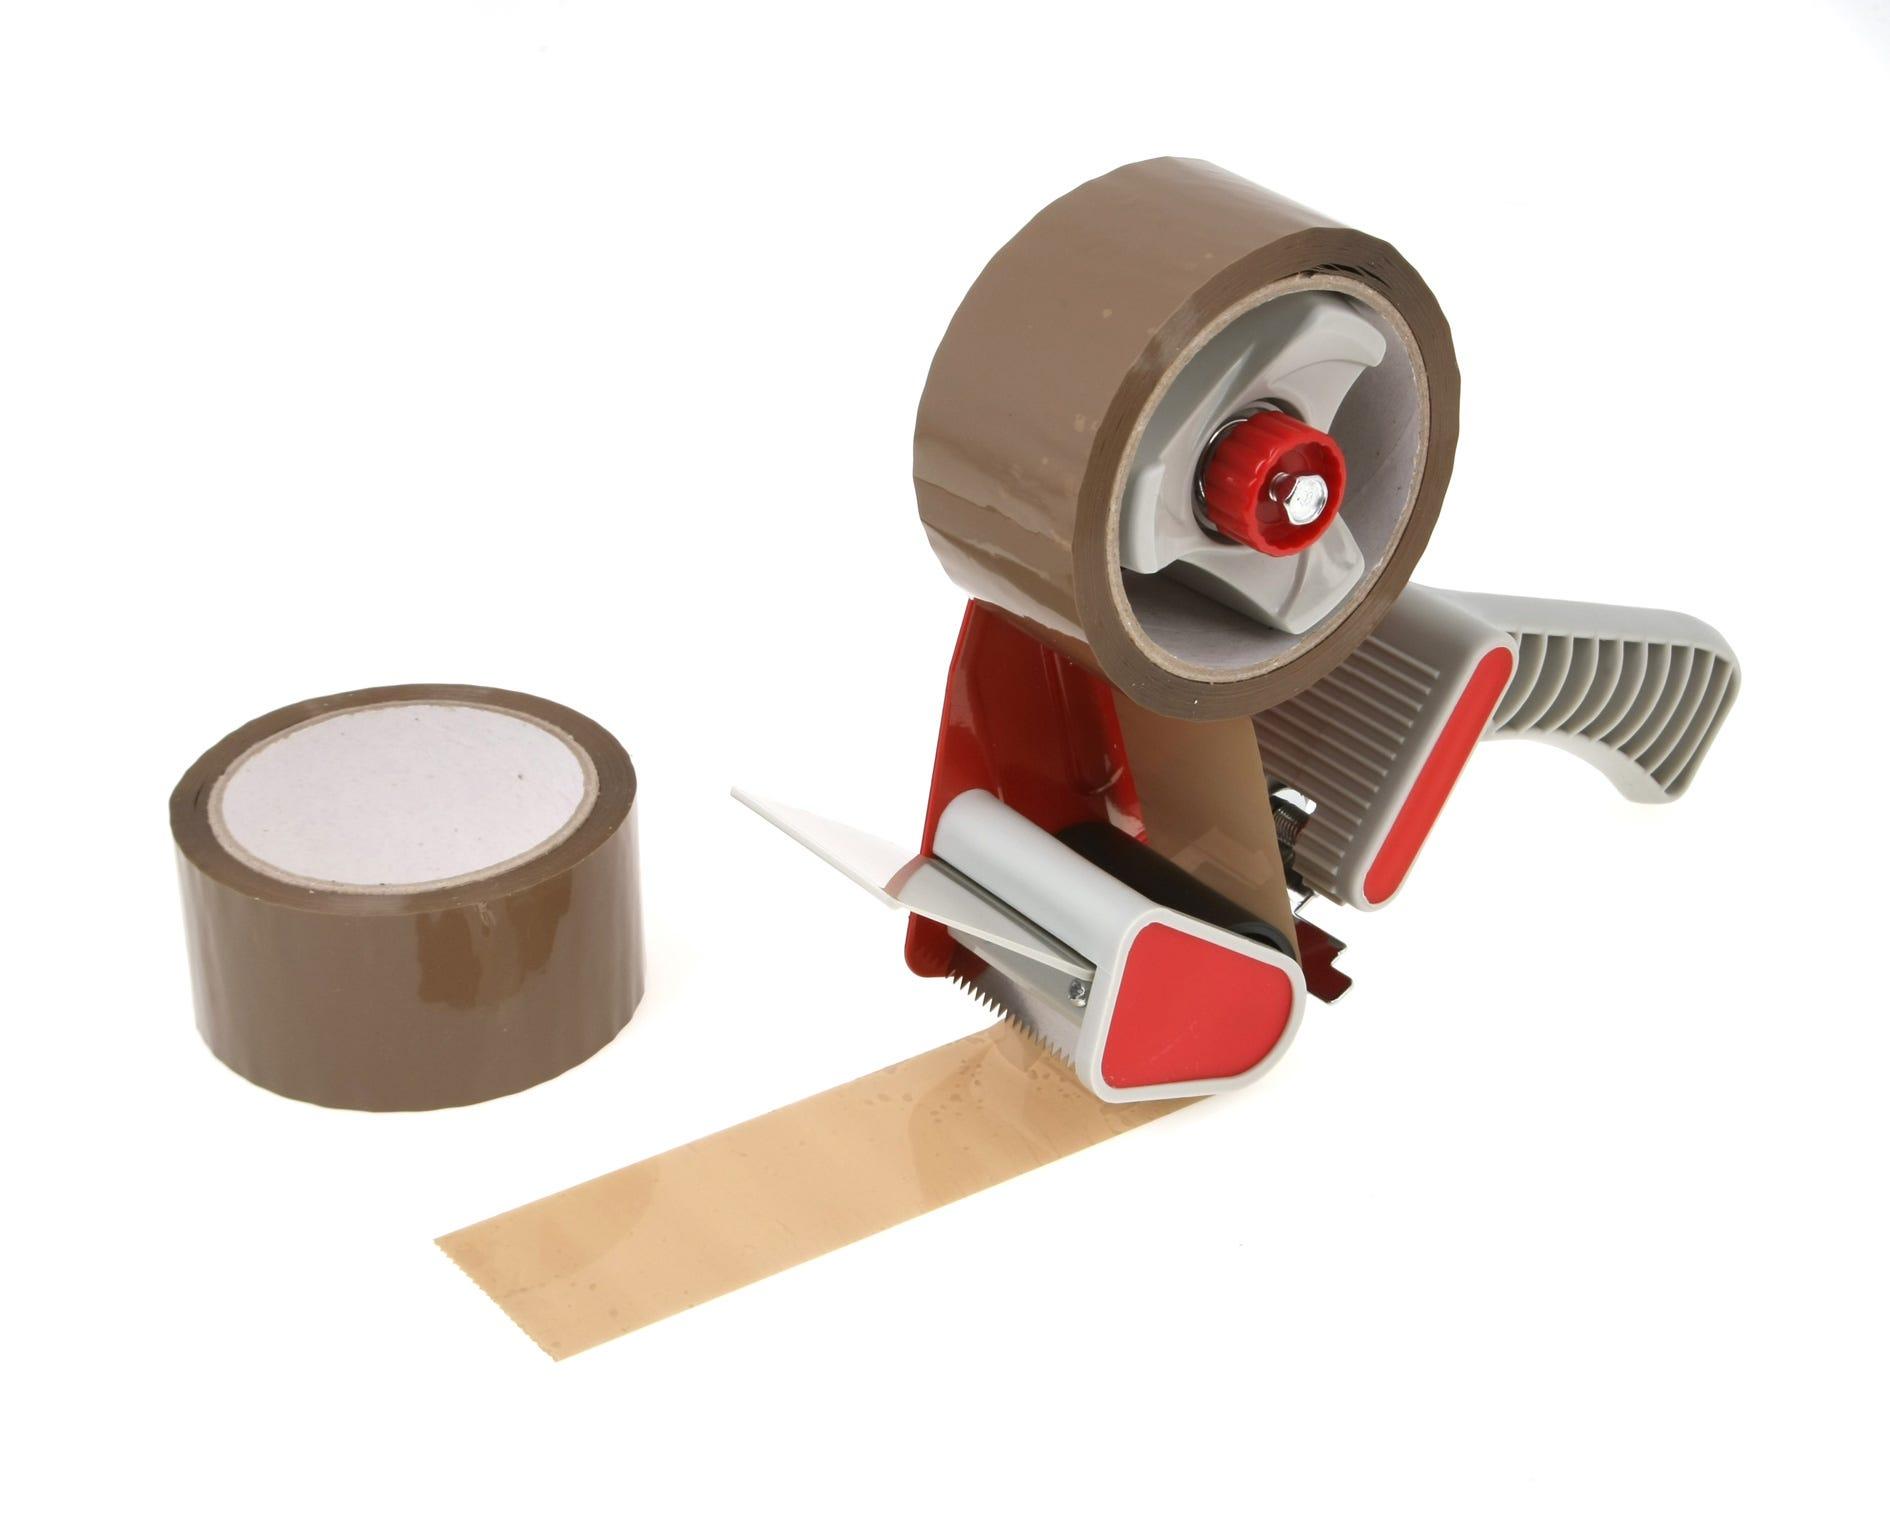 Tape Dispenser Tape Desk Accessories Office Supplies Ryman